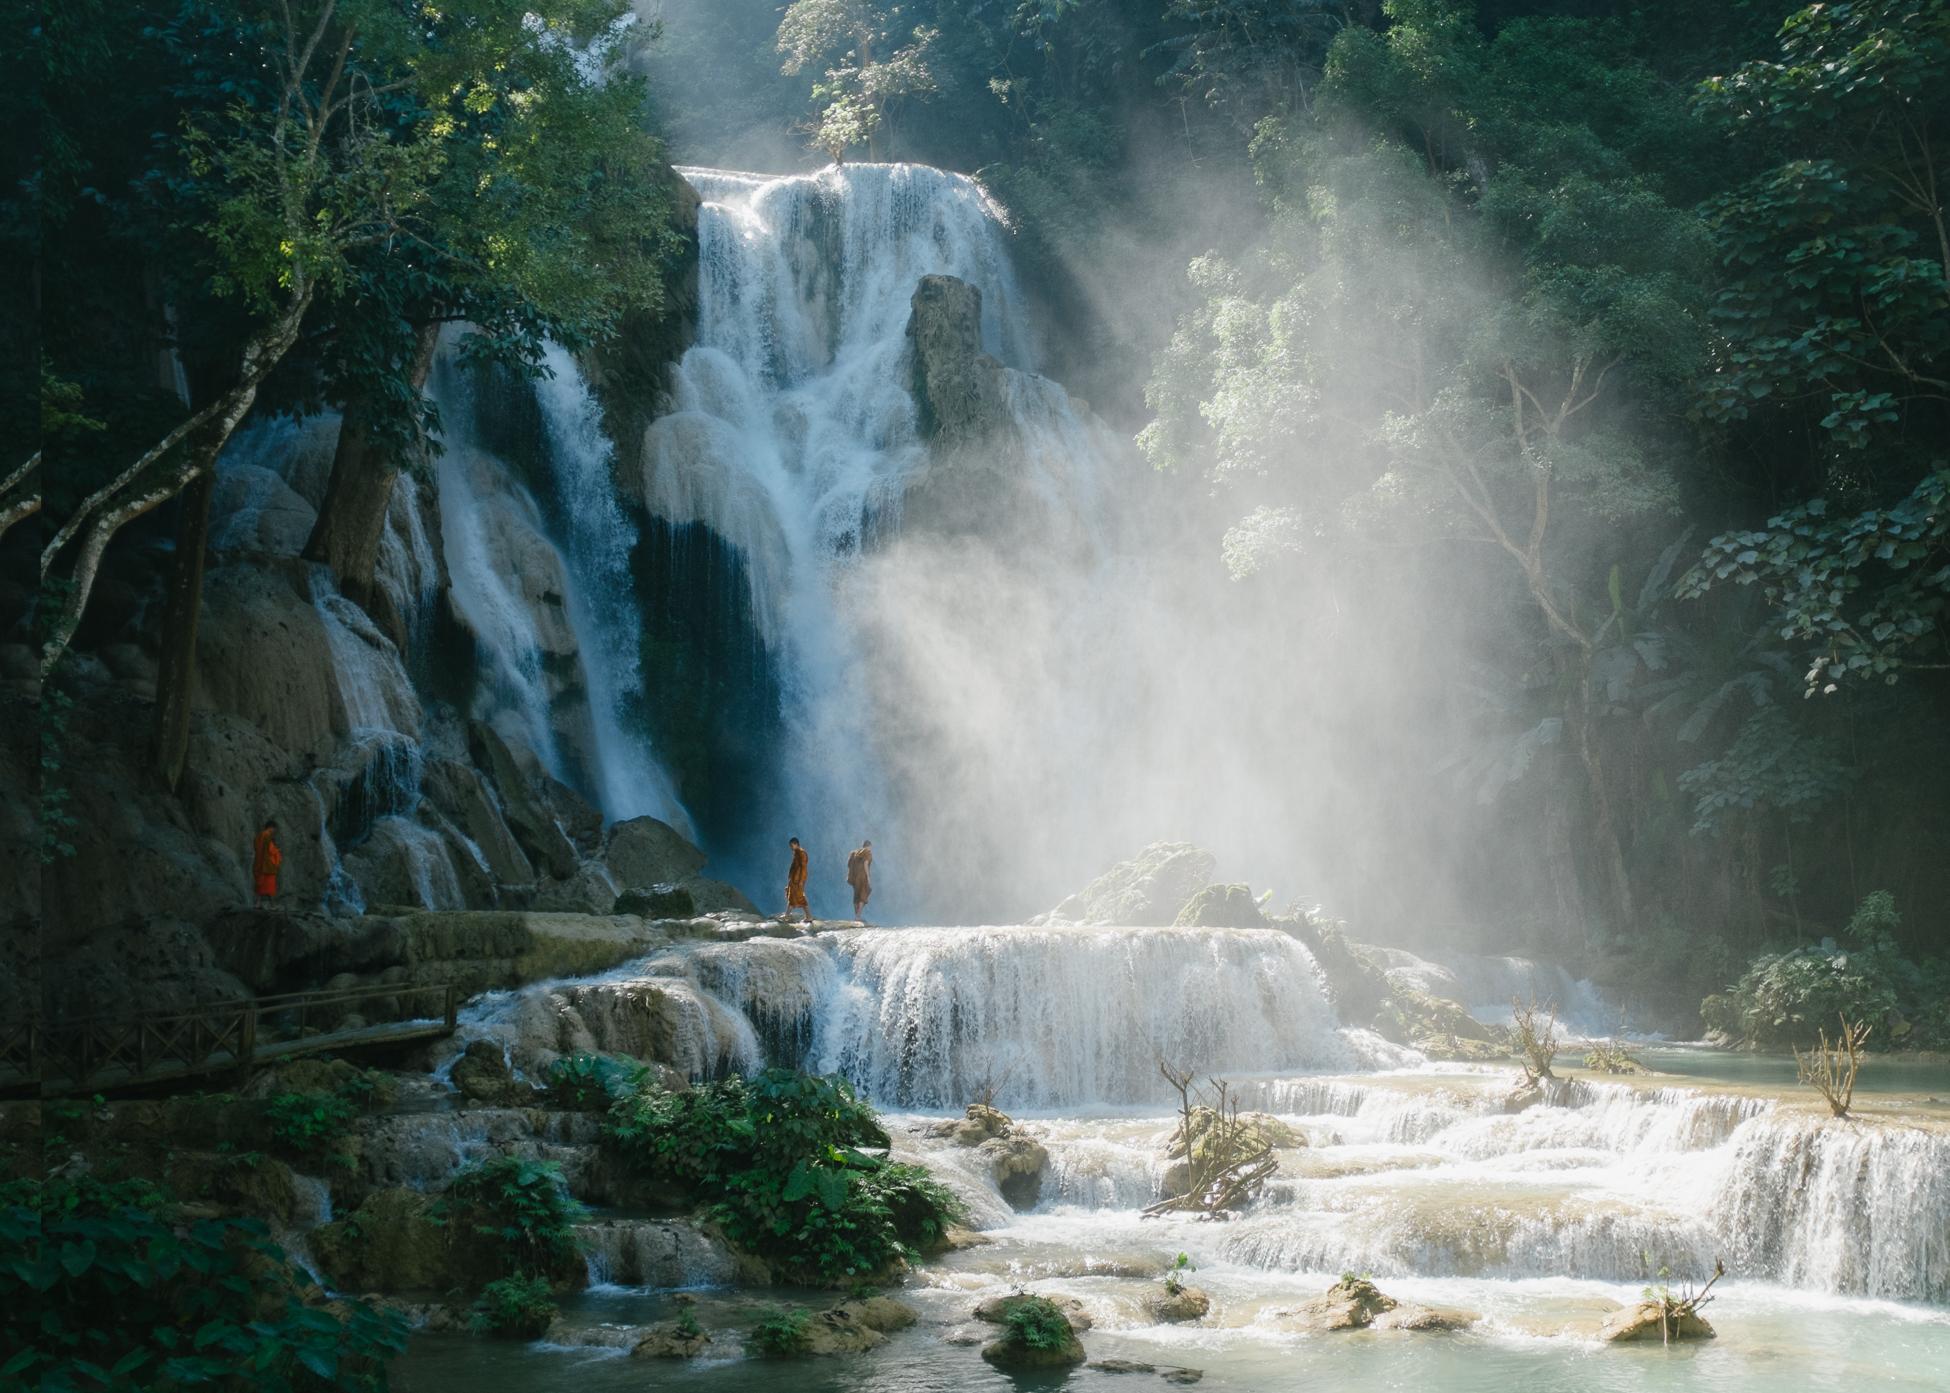 Waterfall, Laos, 2014